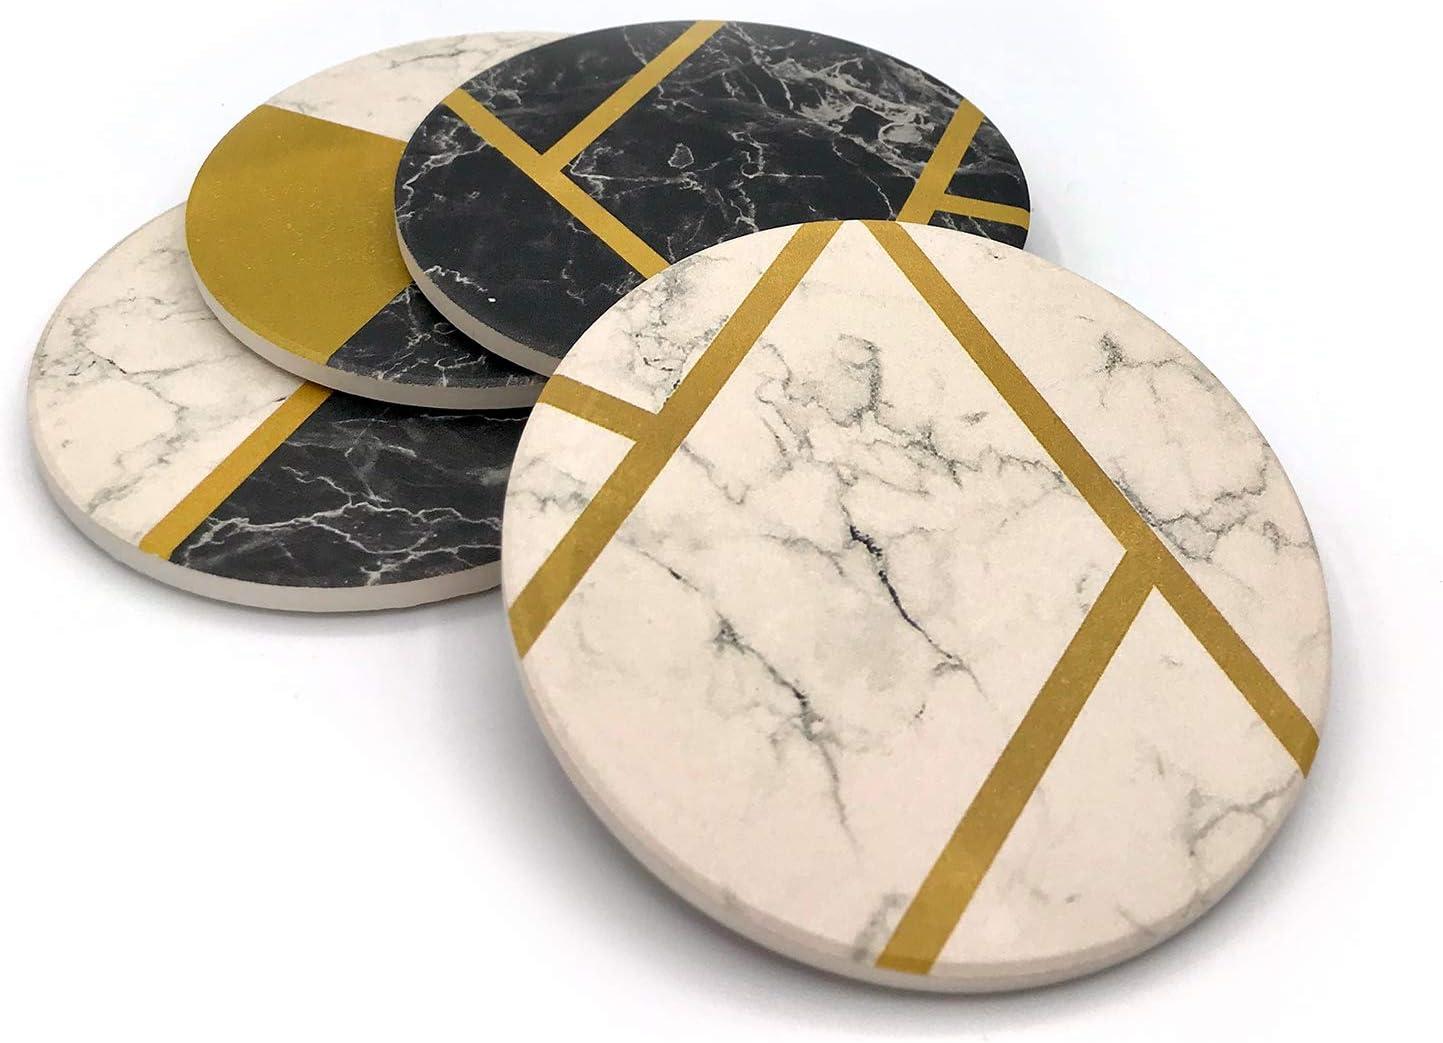 Concrete Decor Gold Painted Concrete Set Of 4 Hexagon Coasters Marble coasters Grey Coasters. Cement coasters Concrete coasters